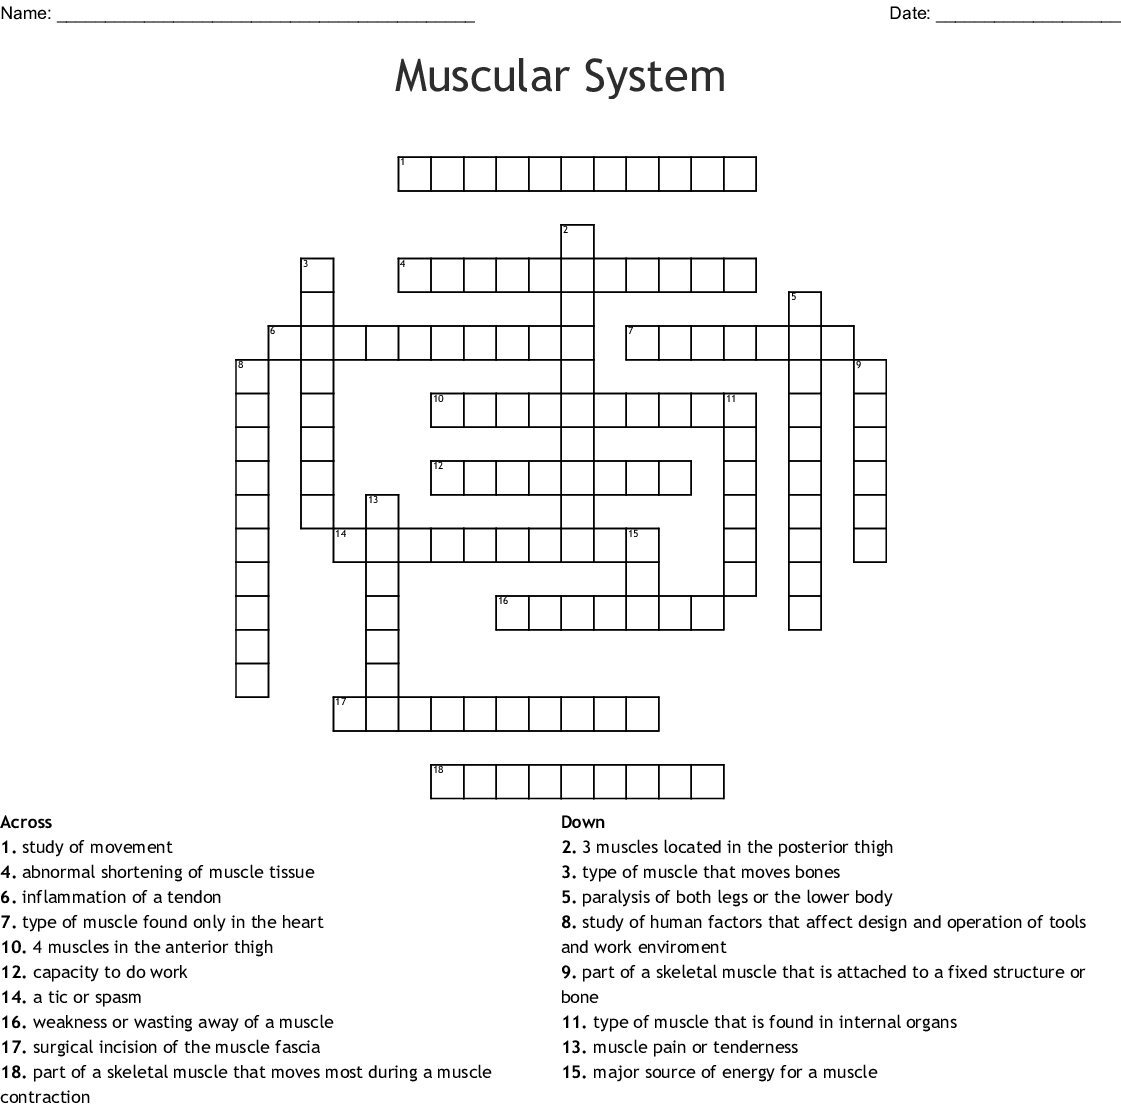 Muscular System Crossword Wordmint